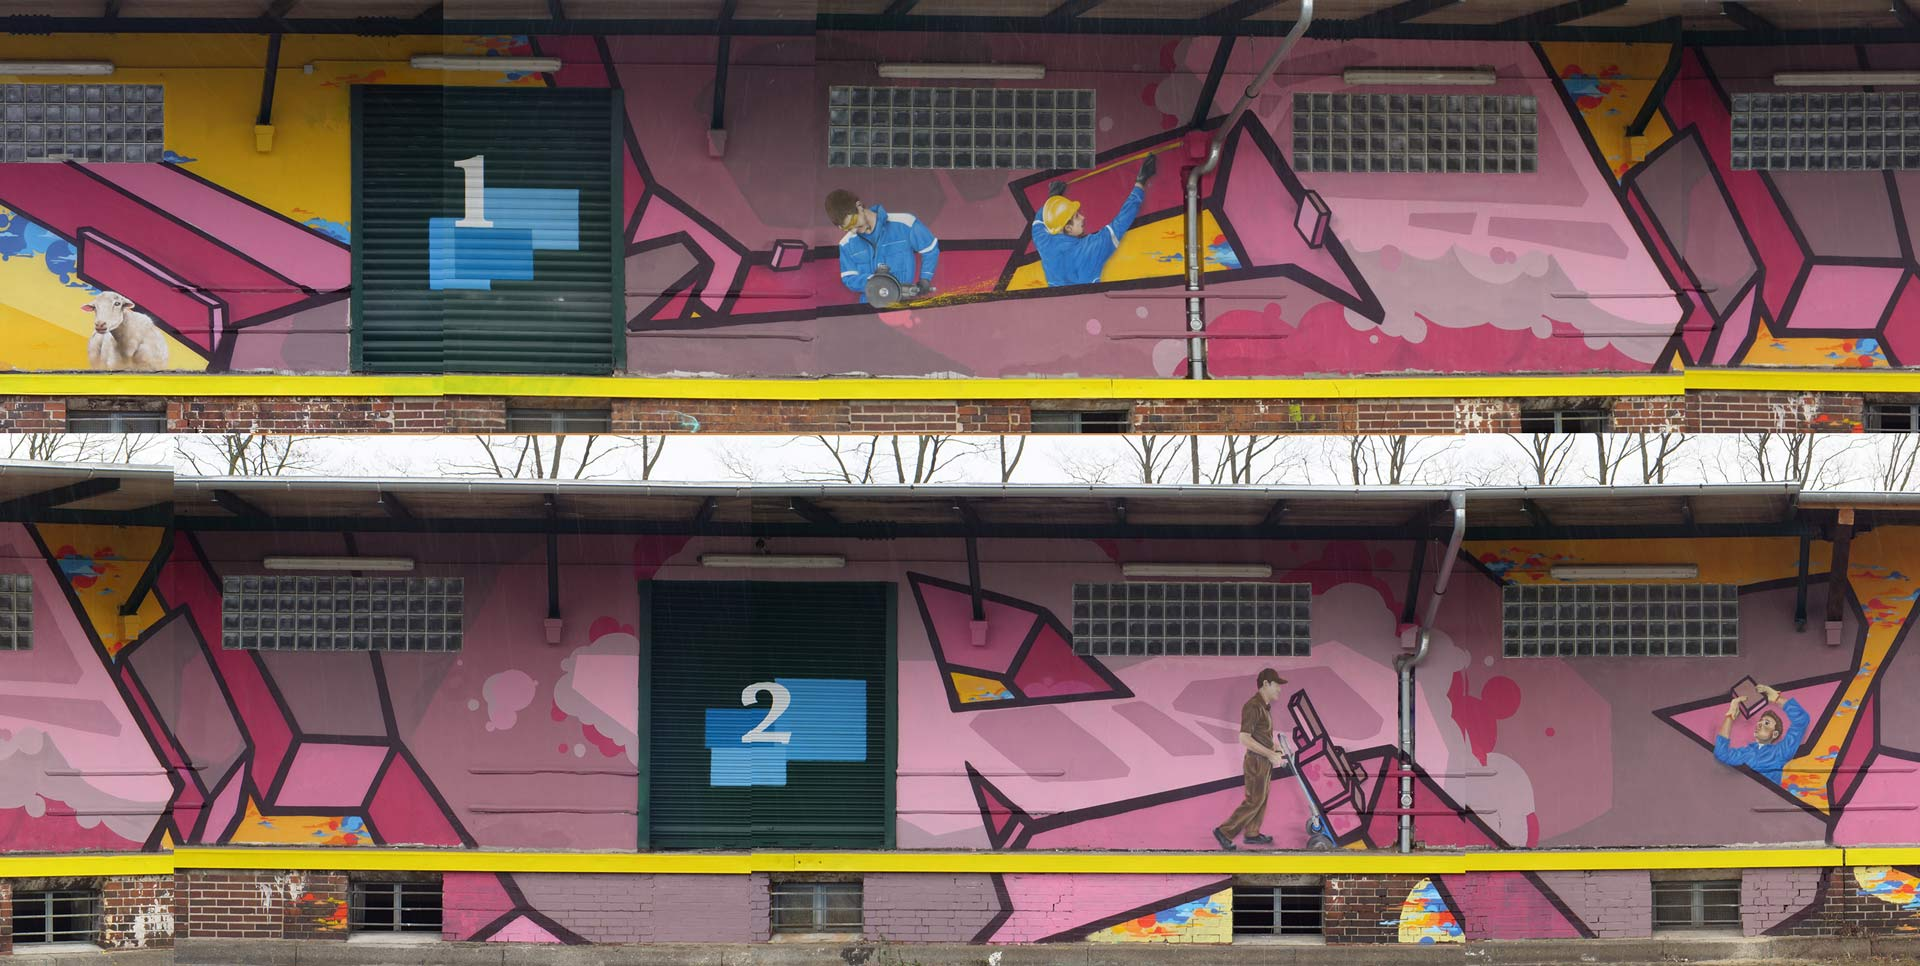 Riese Graffiti Lagerhalle